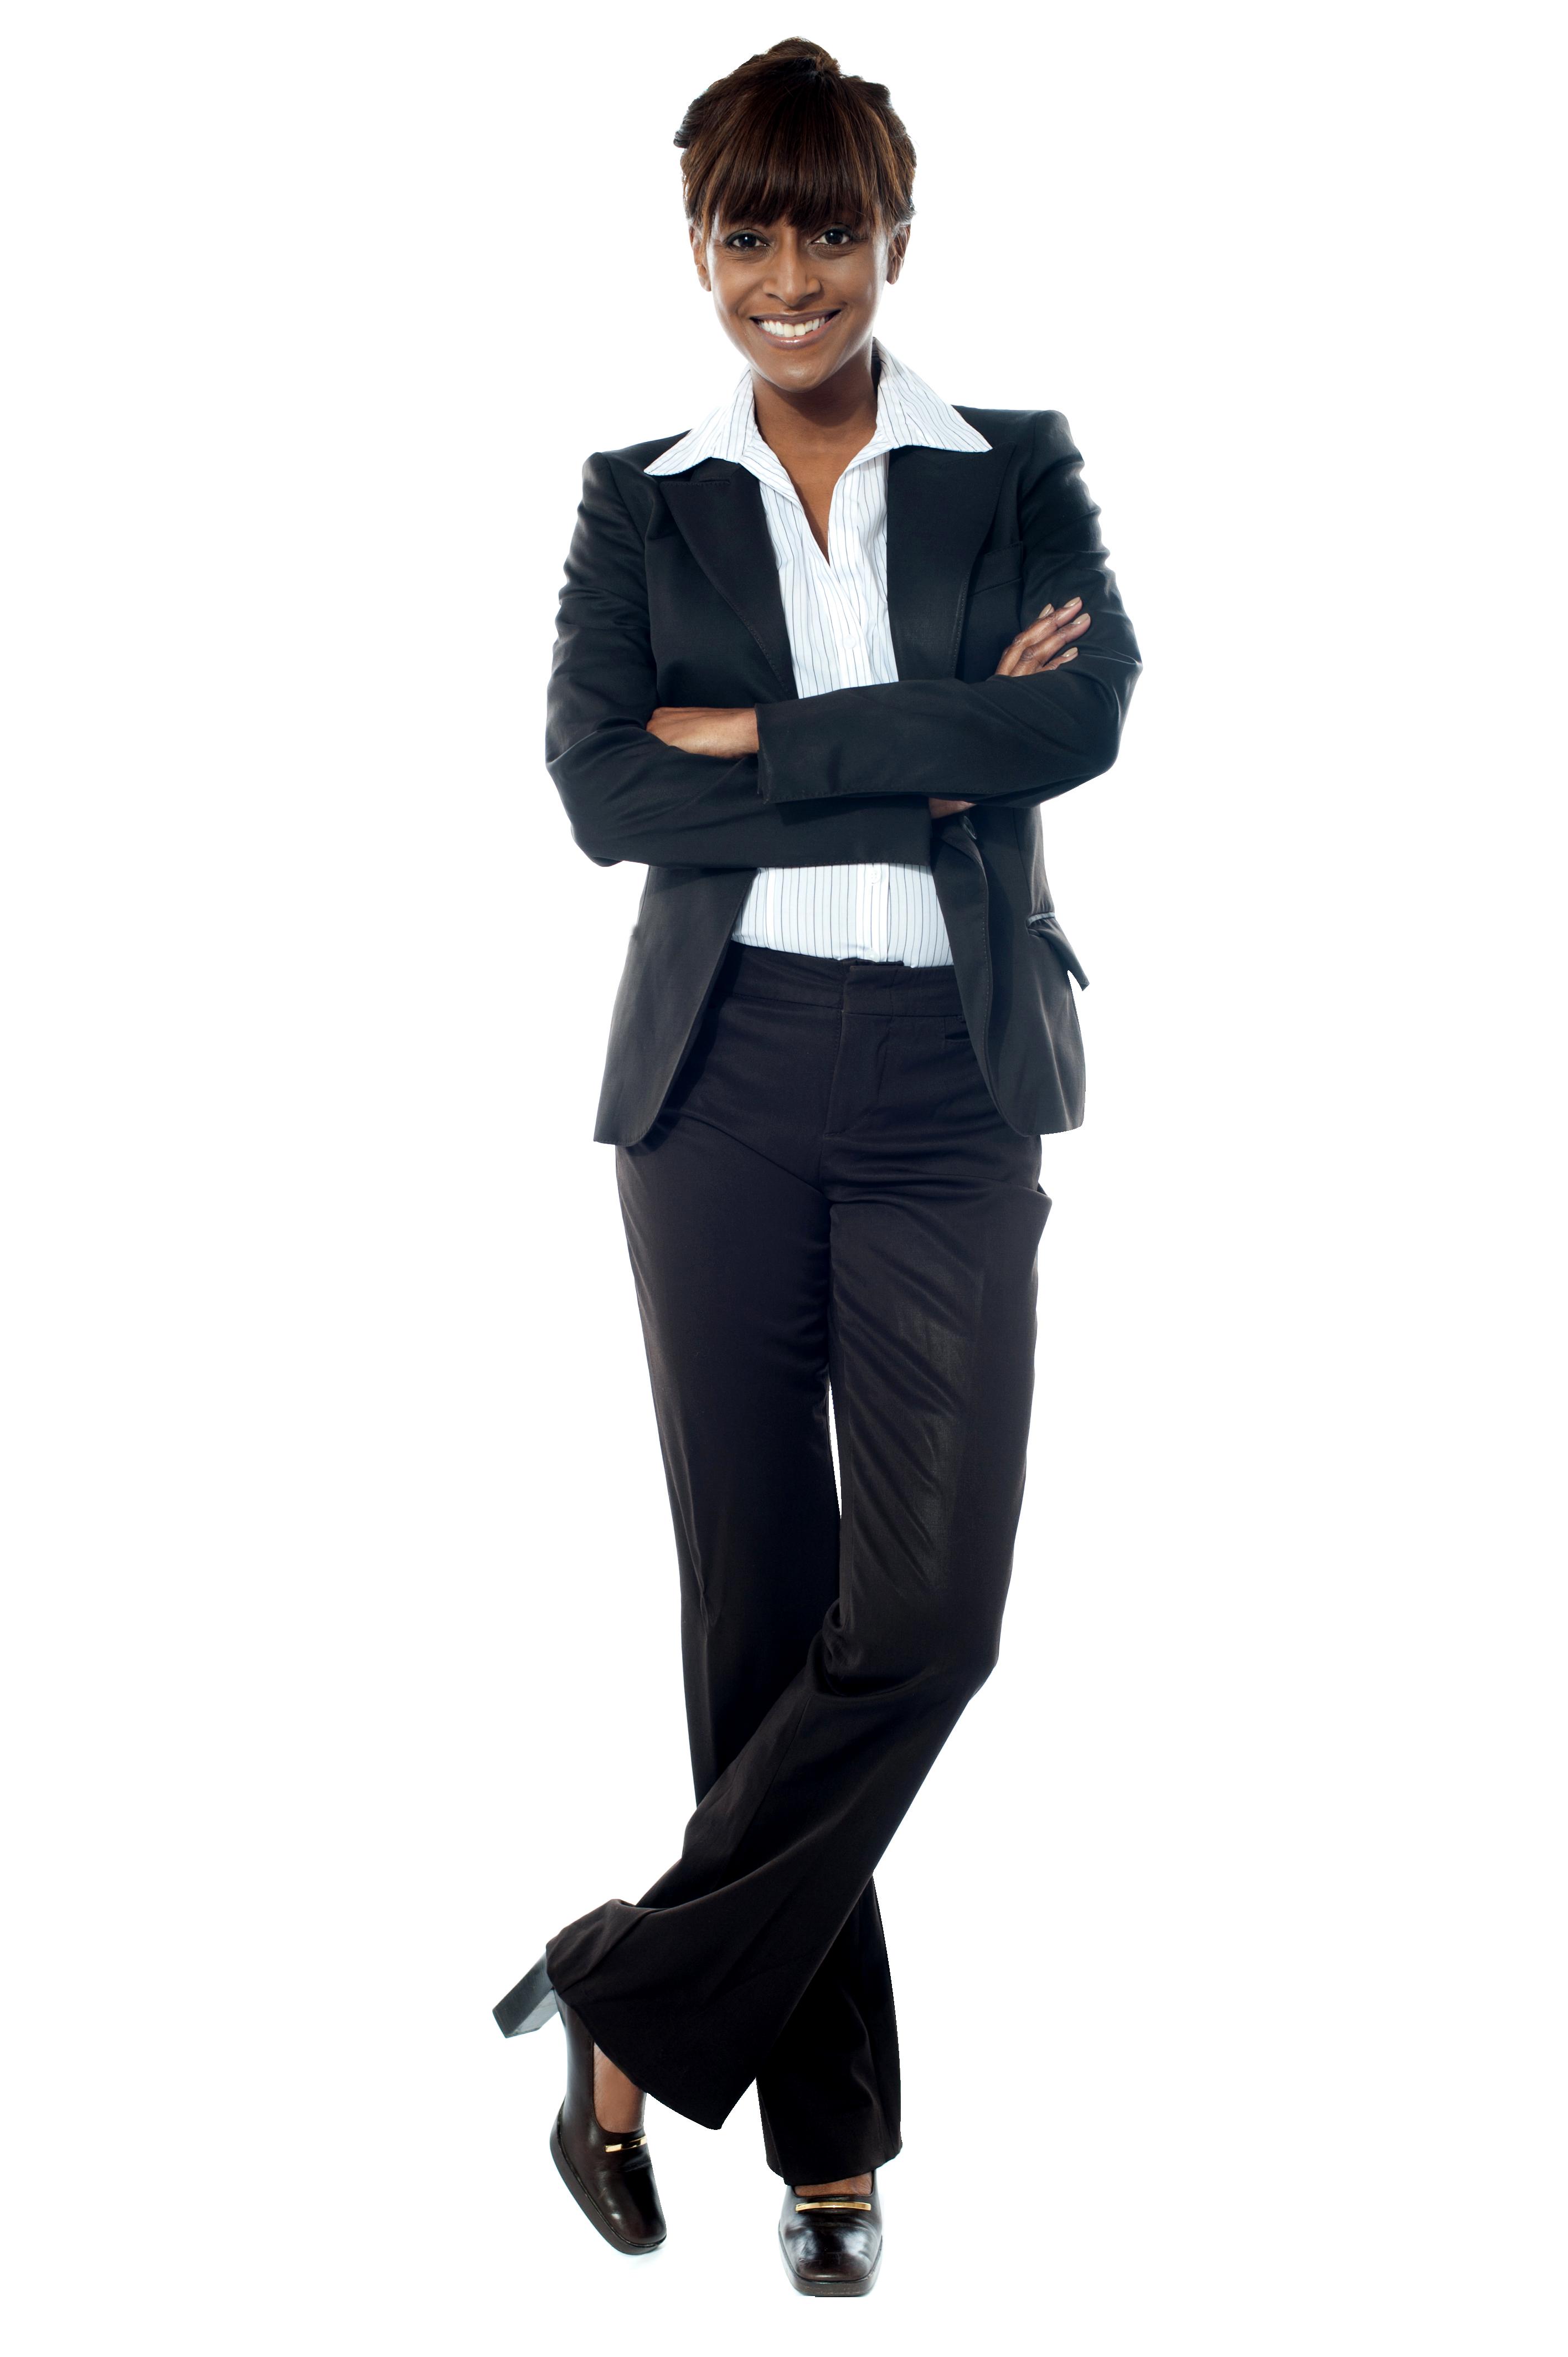 Business Man Png Image Business Man Man Business